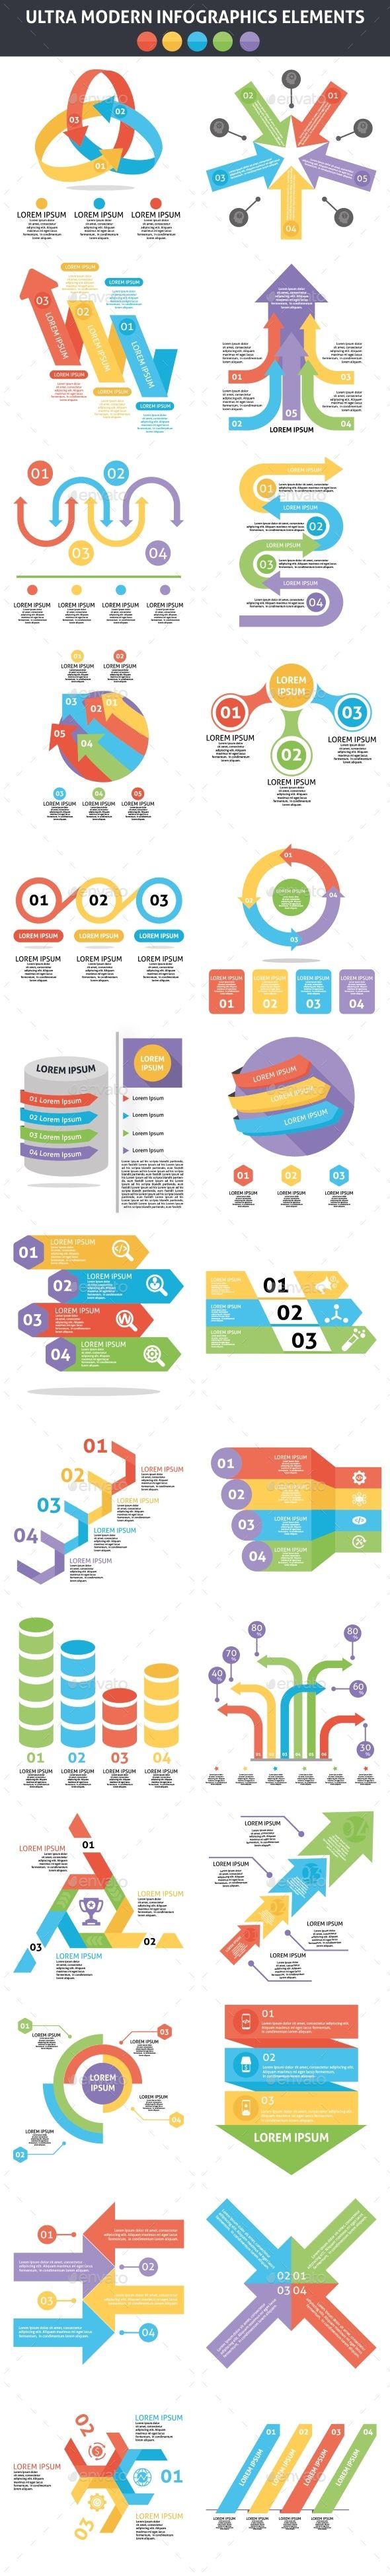 Ultra Modern Infographics Elements Templates PSD, Vector EPS, AI Illustrator